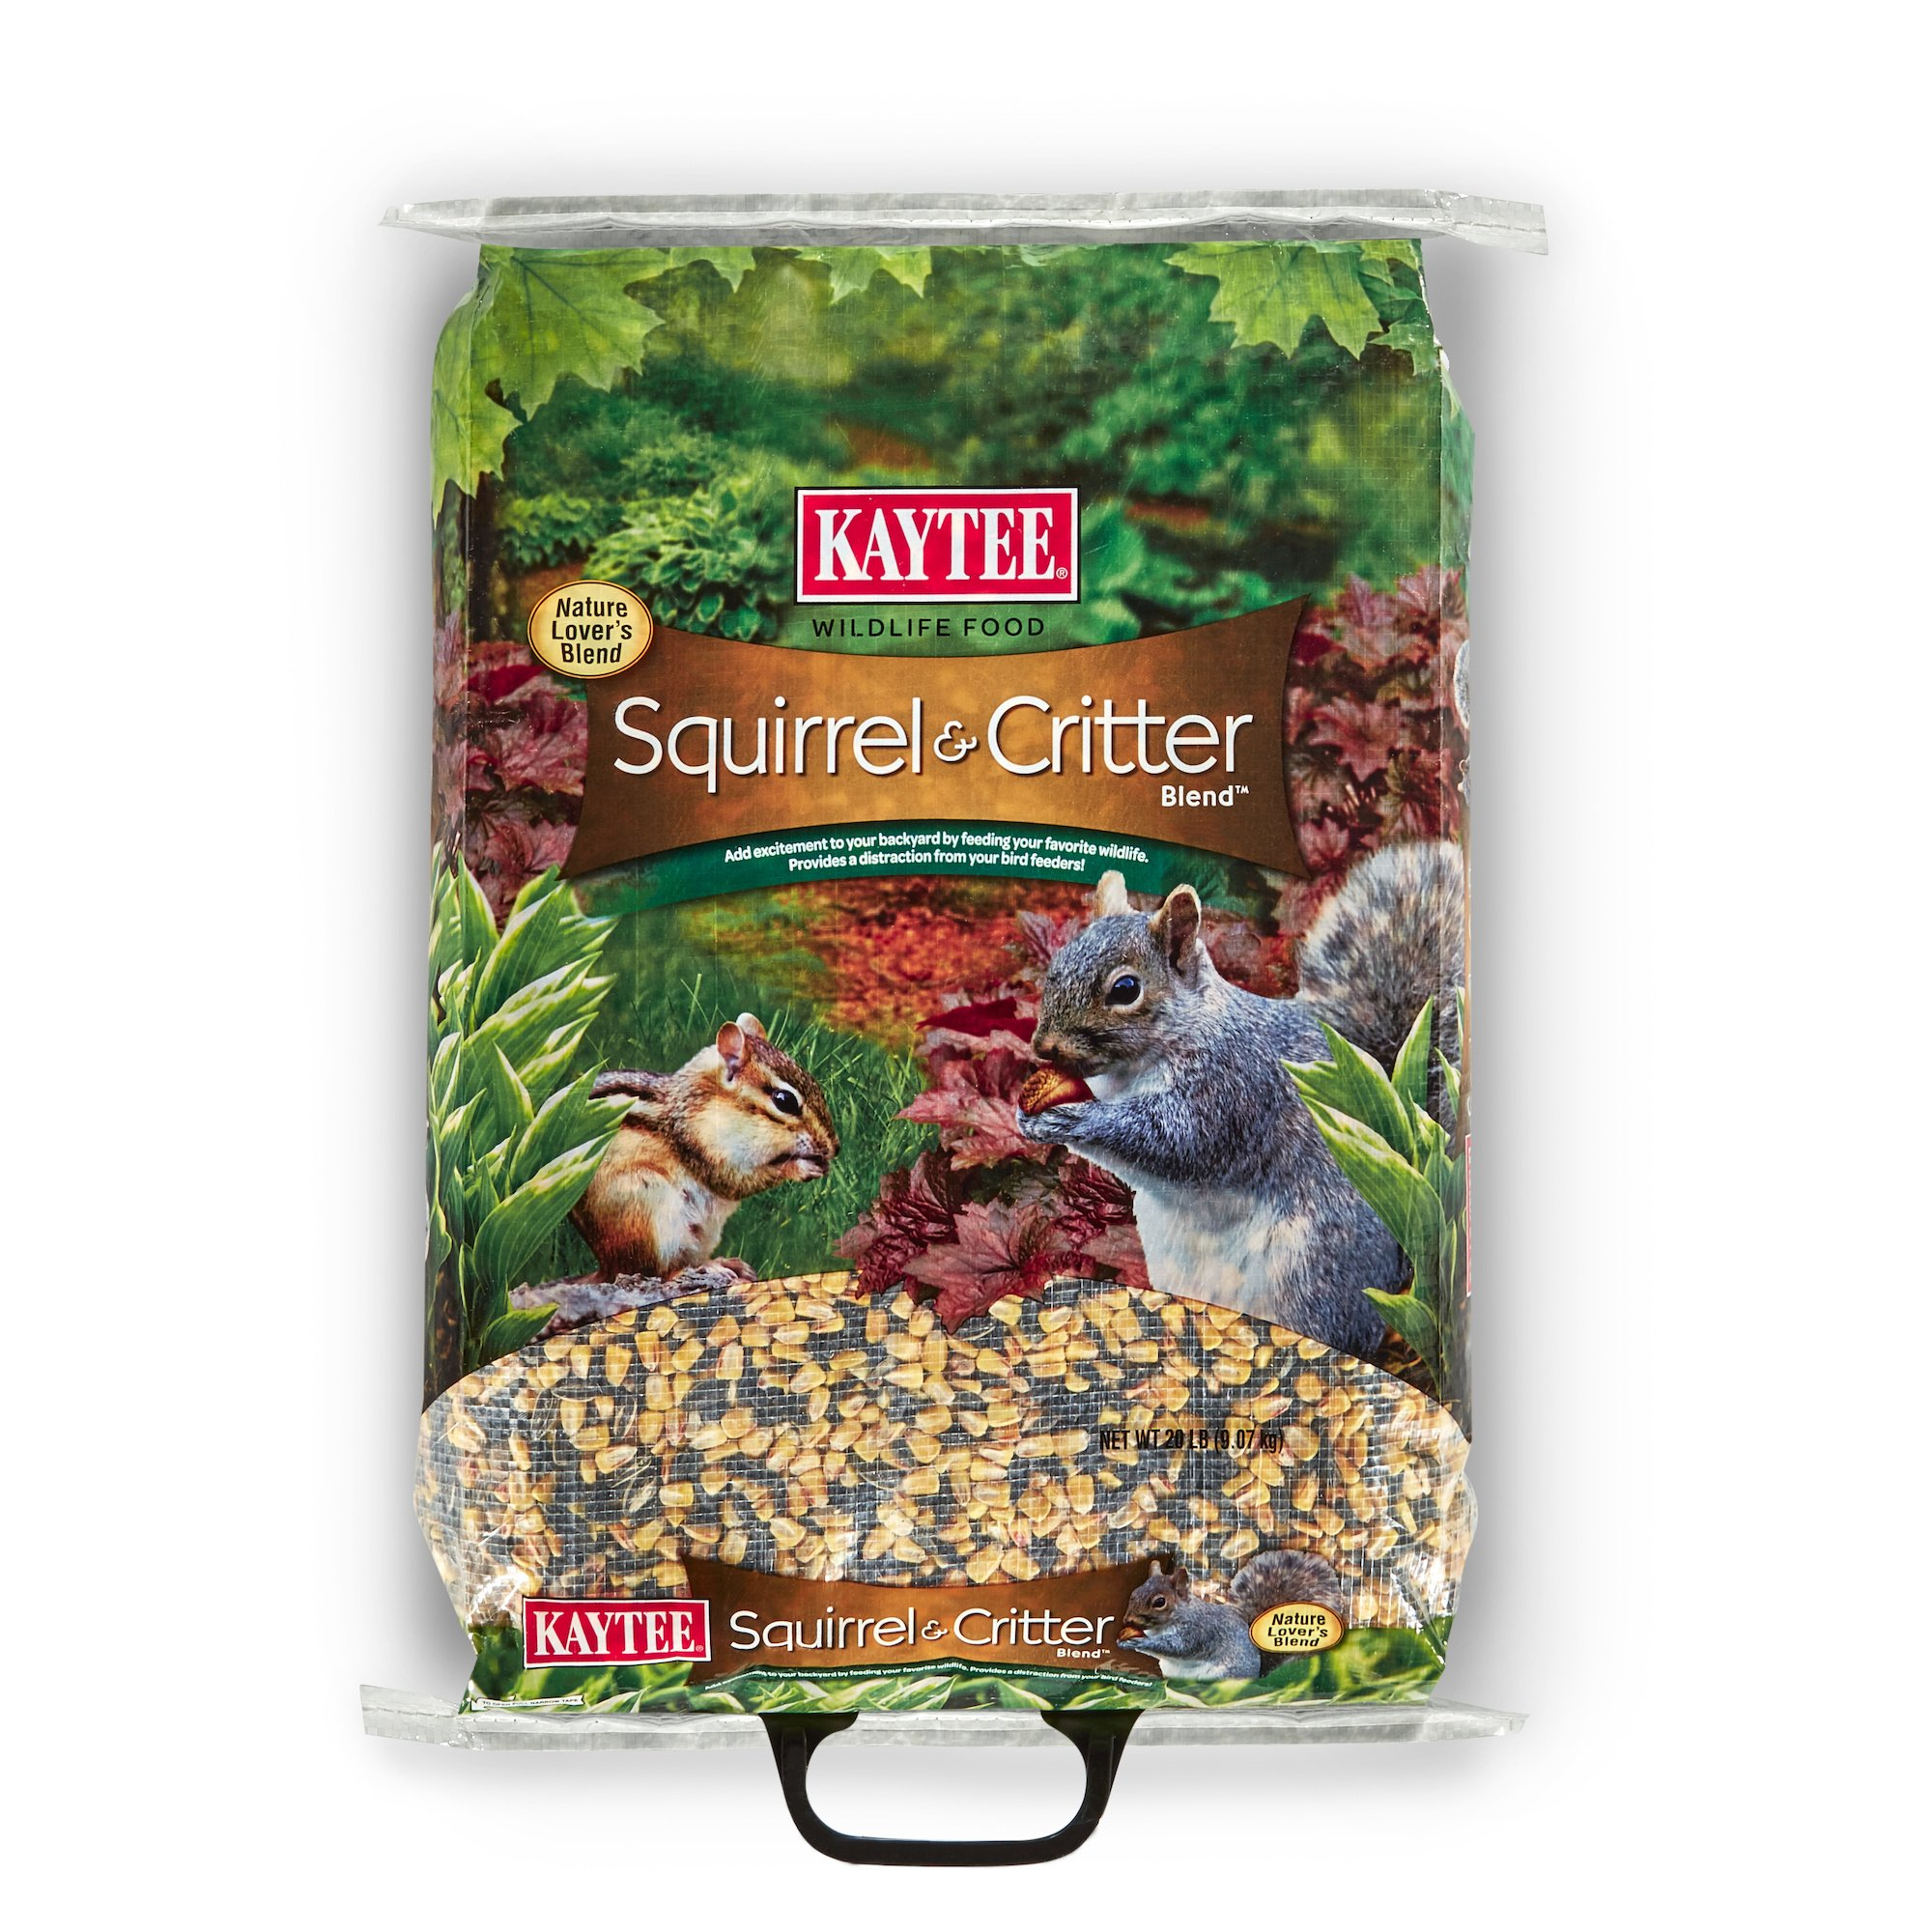 Kaytee Squirrel and Critter Blend, 20-Pound